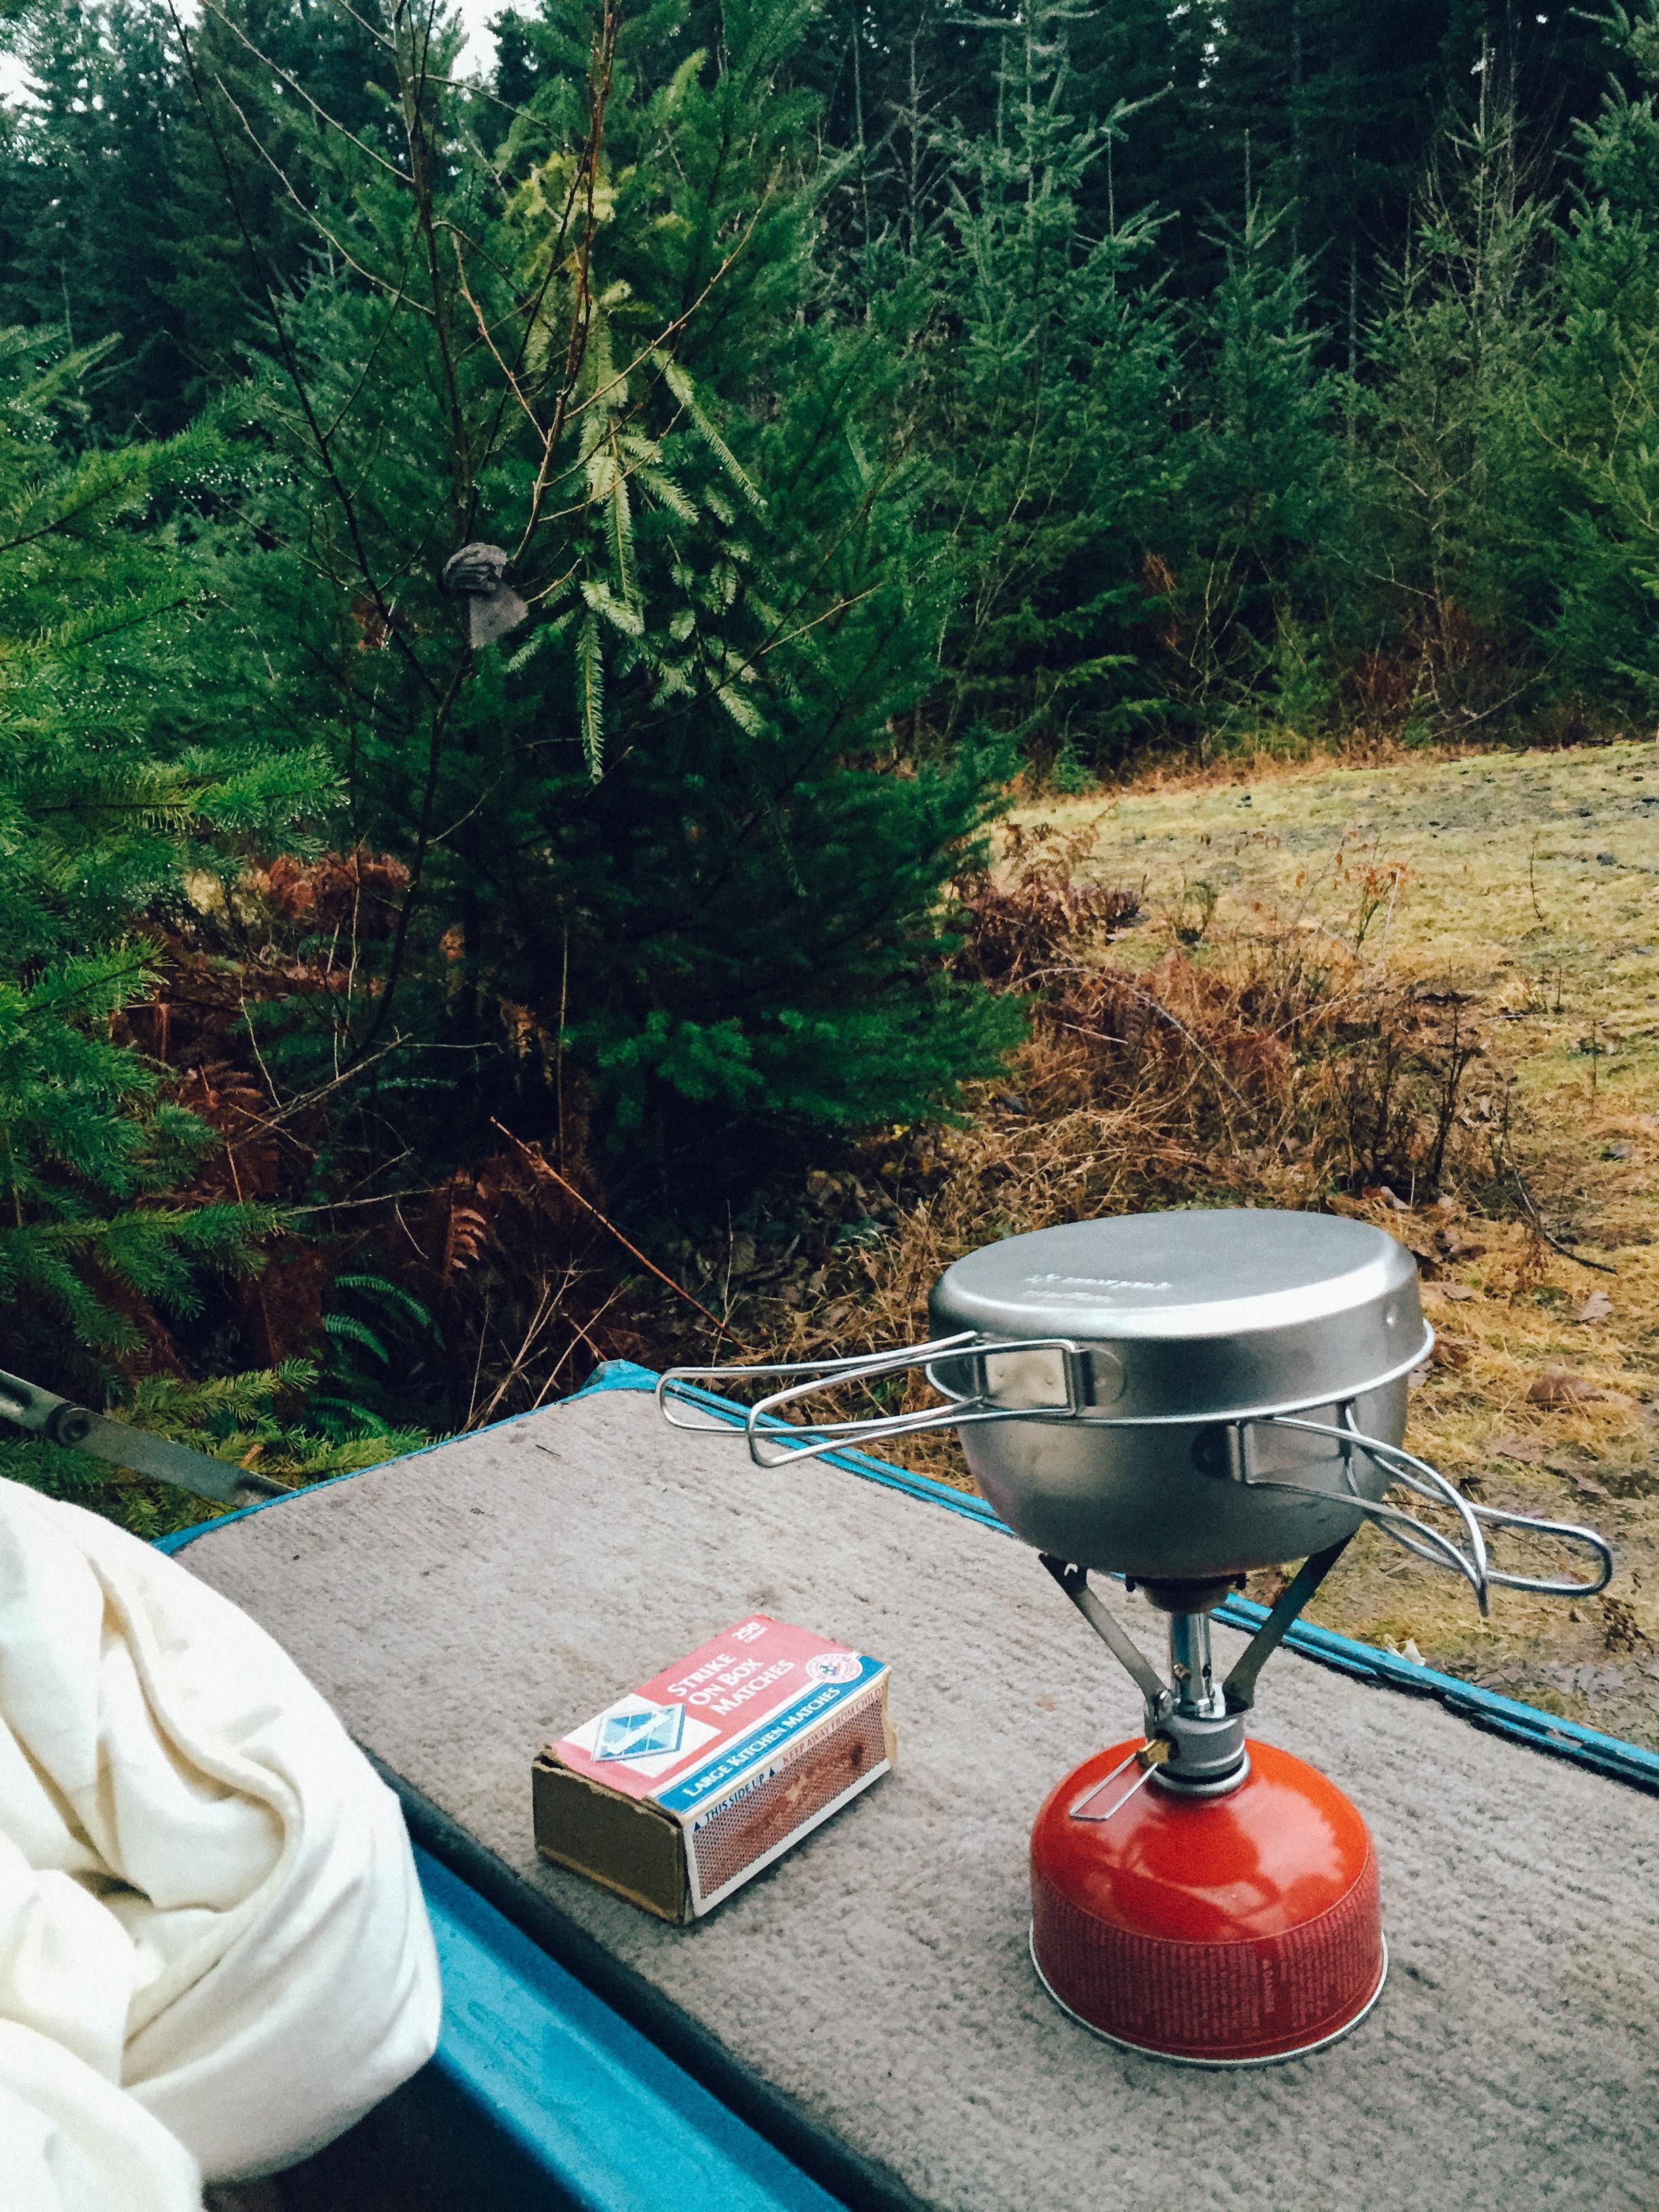 Camp Thief eyes breakfast.